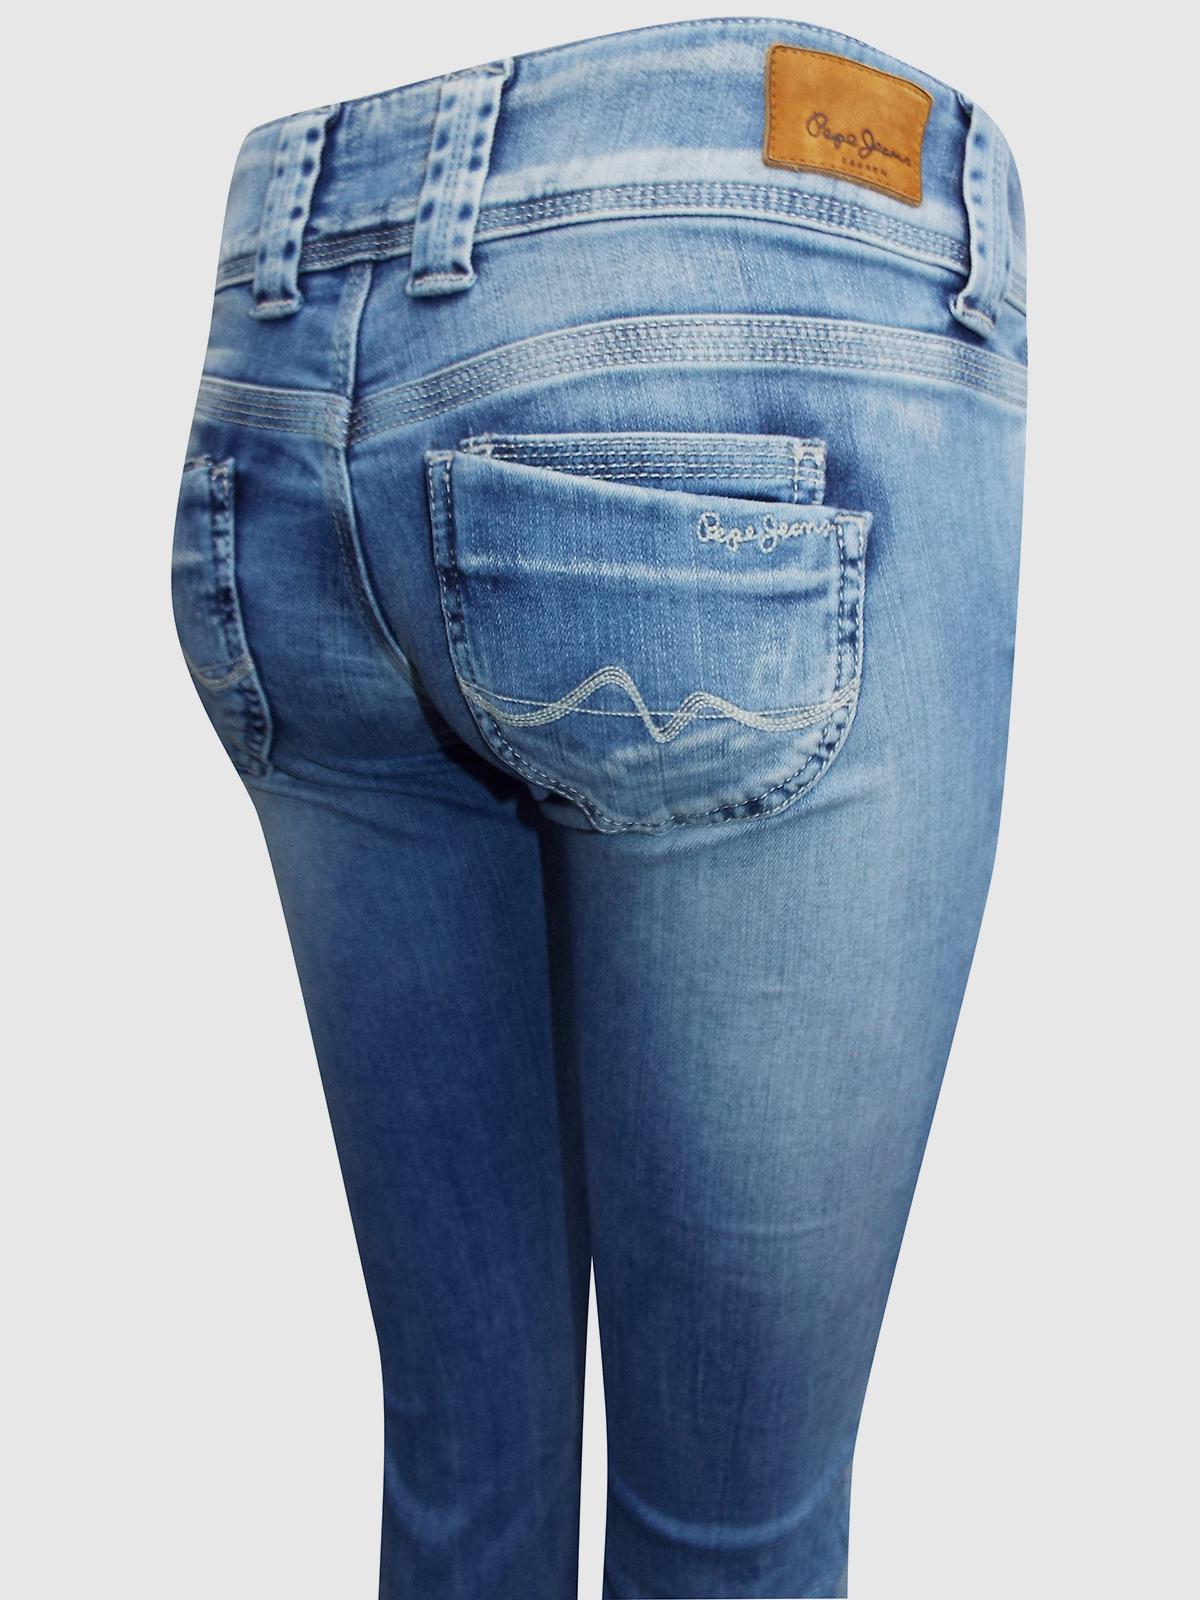 Pepe Jeans LIGHT-DENIM Venus Low Rise Regular Fit Straight Leg Denim Jeans